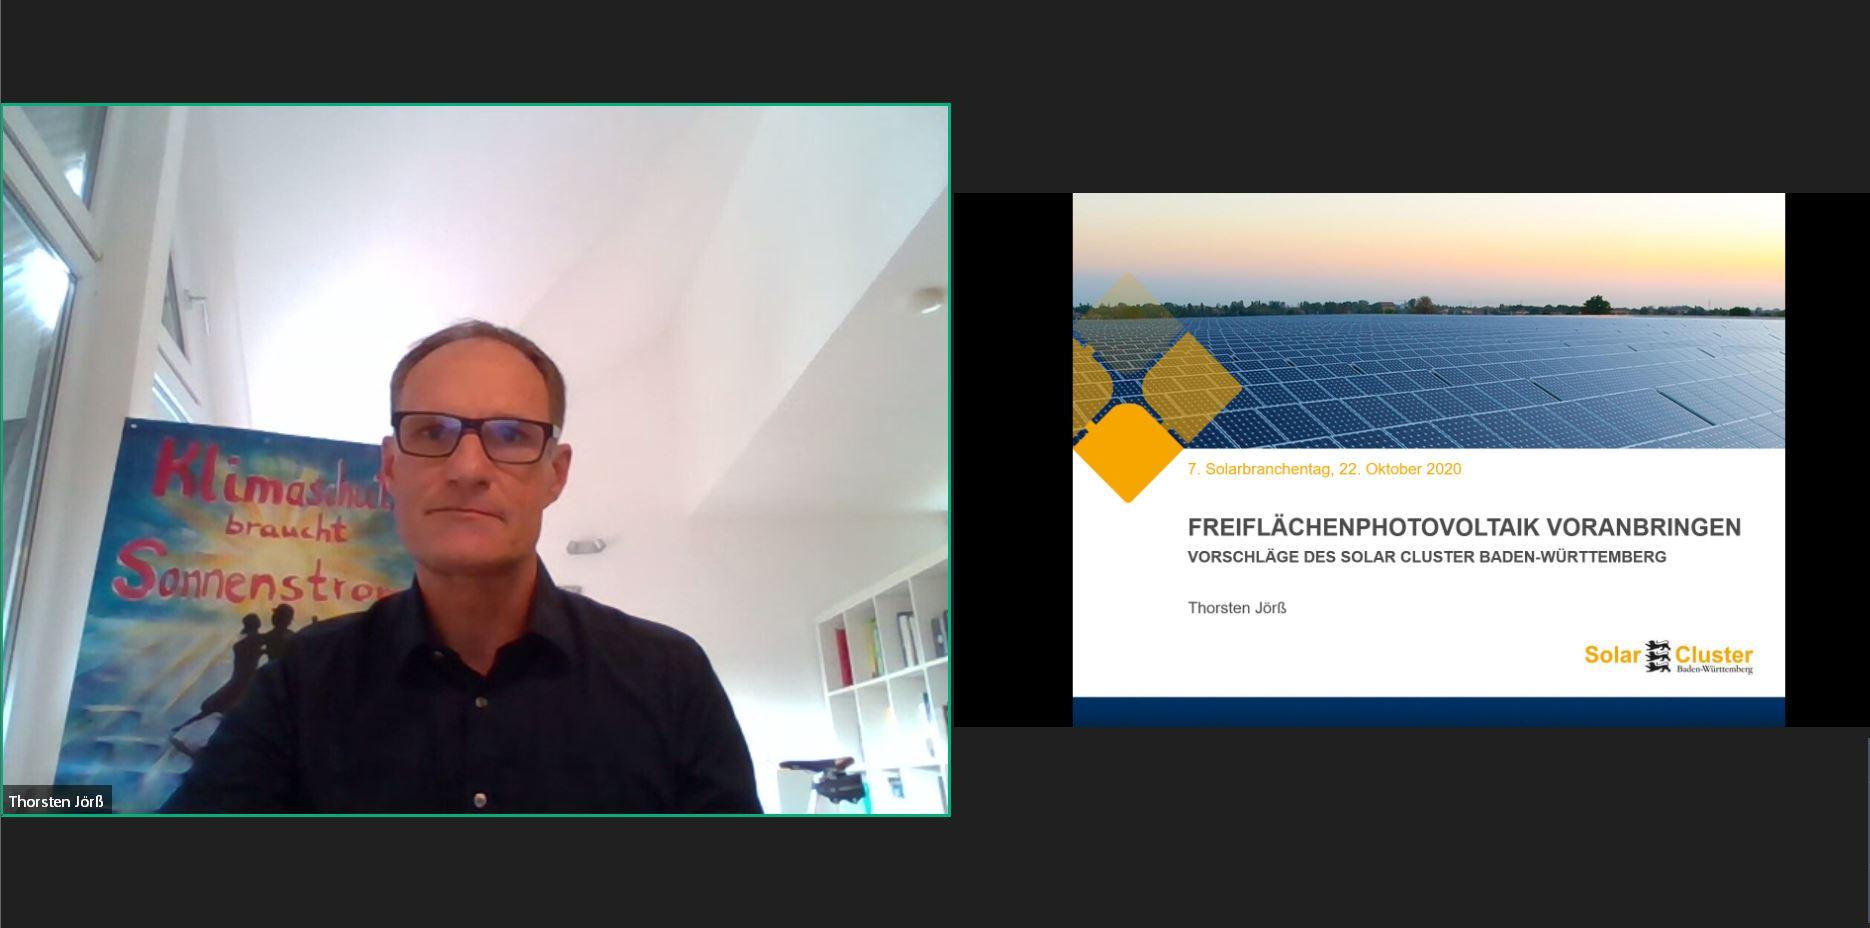 Rückblick Solarbranchentag 2020 Freiflächenphotovoltaik